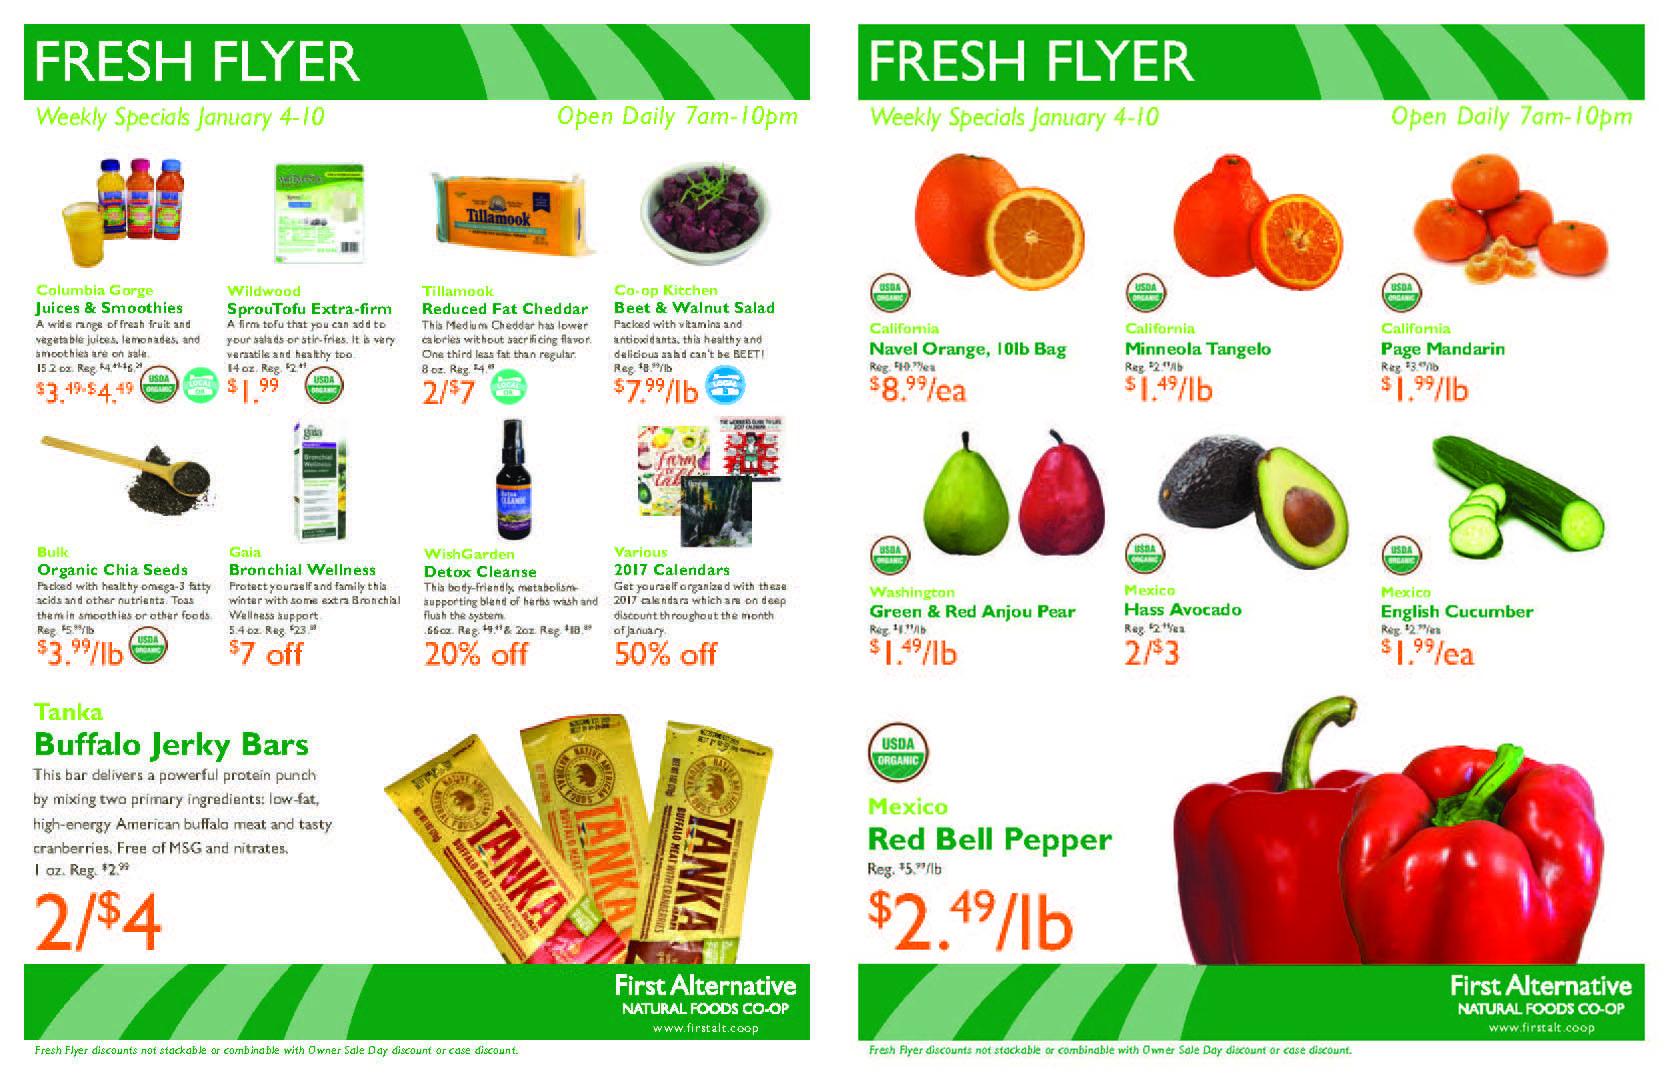 first alternative fresh flyer jan 4-10